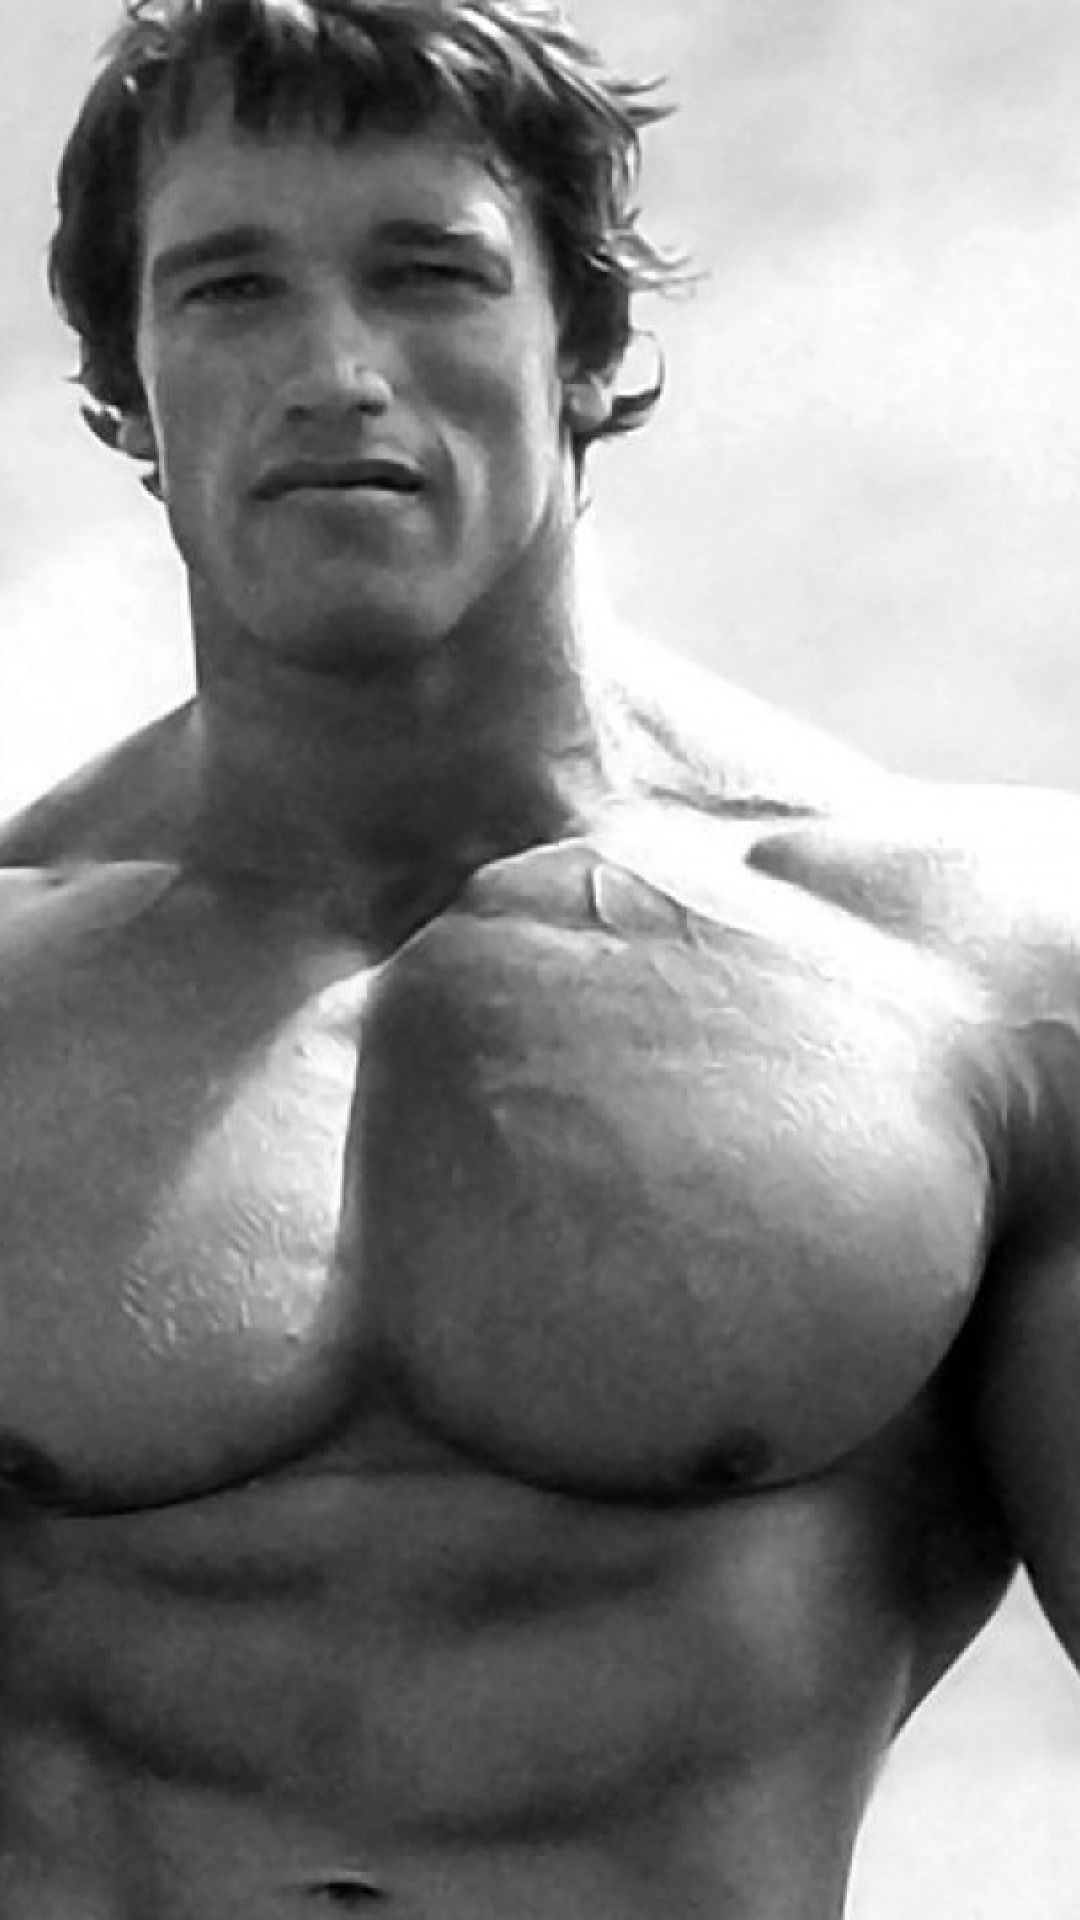 Hd Arnold Schwarzenegger Iphone Wallpapers